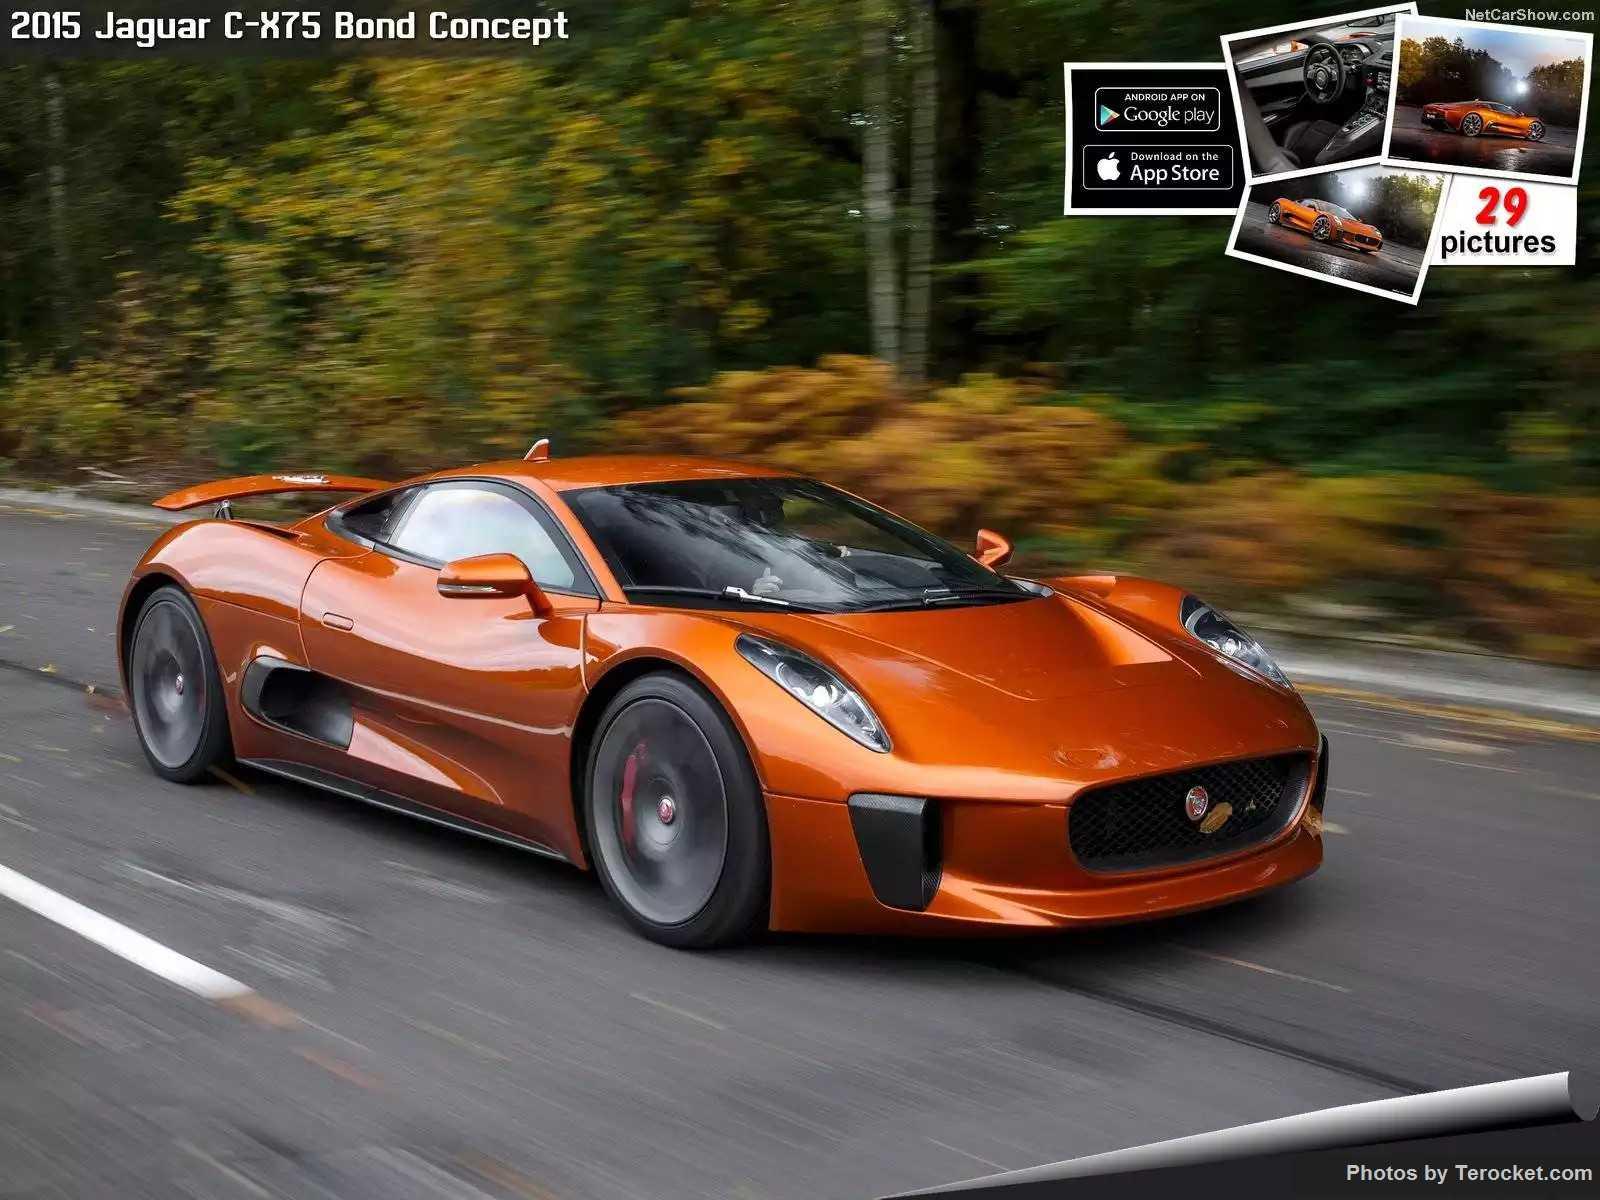 Hình ảnh siêu xe Jaguar C-X75 Bond Concept 2015 & nội ngoại thất